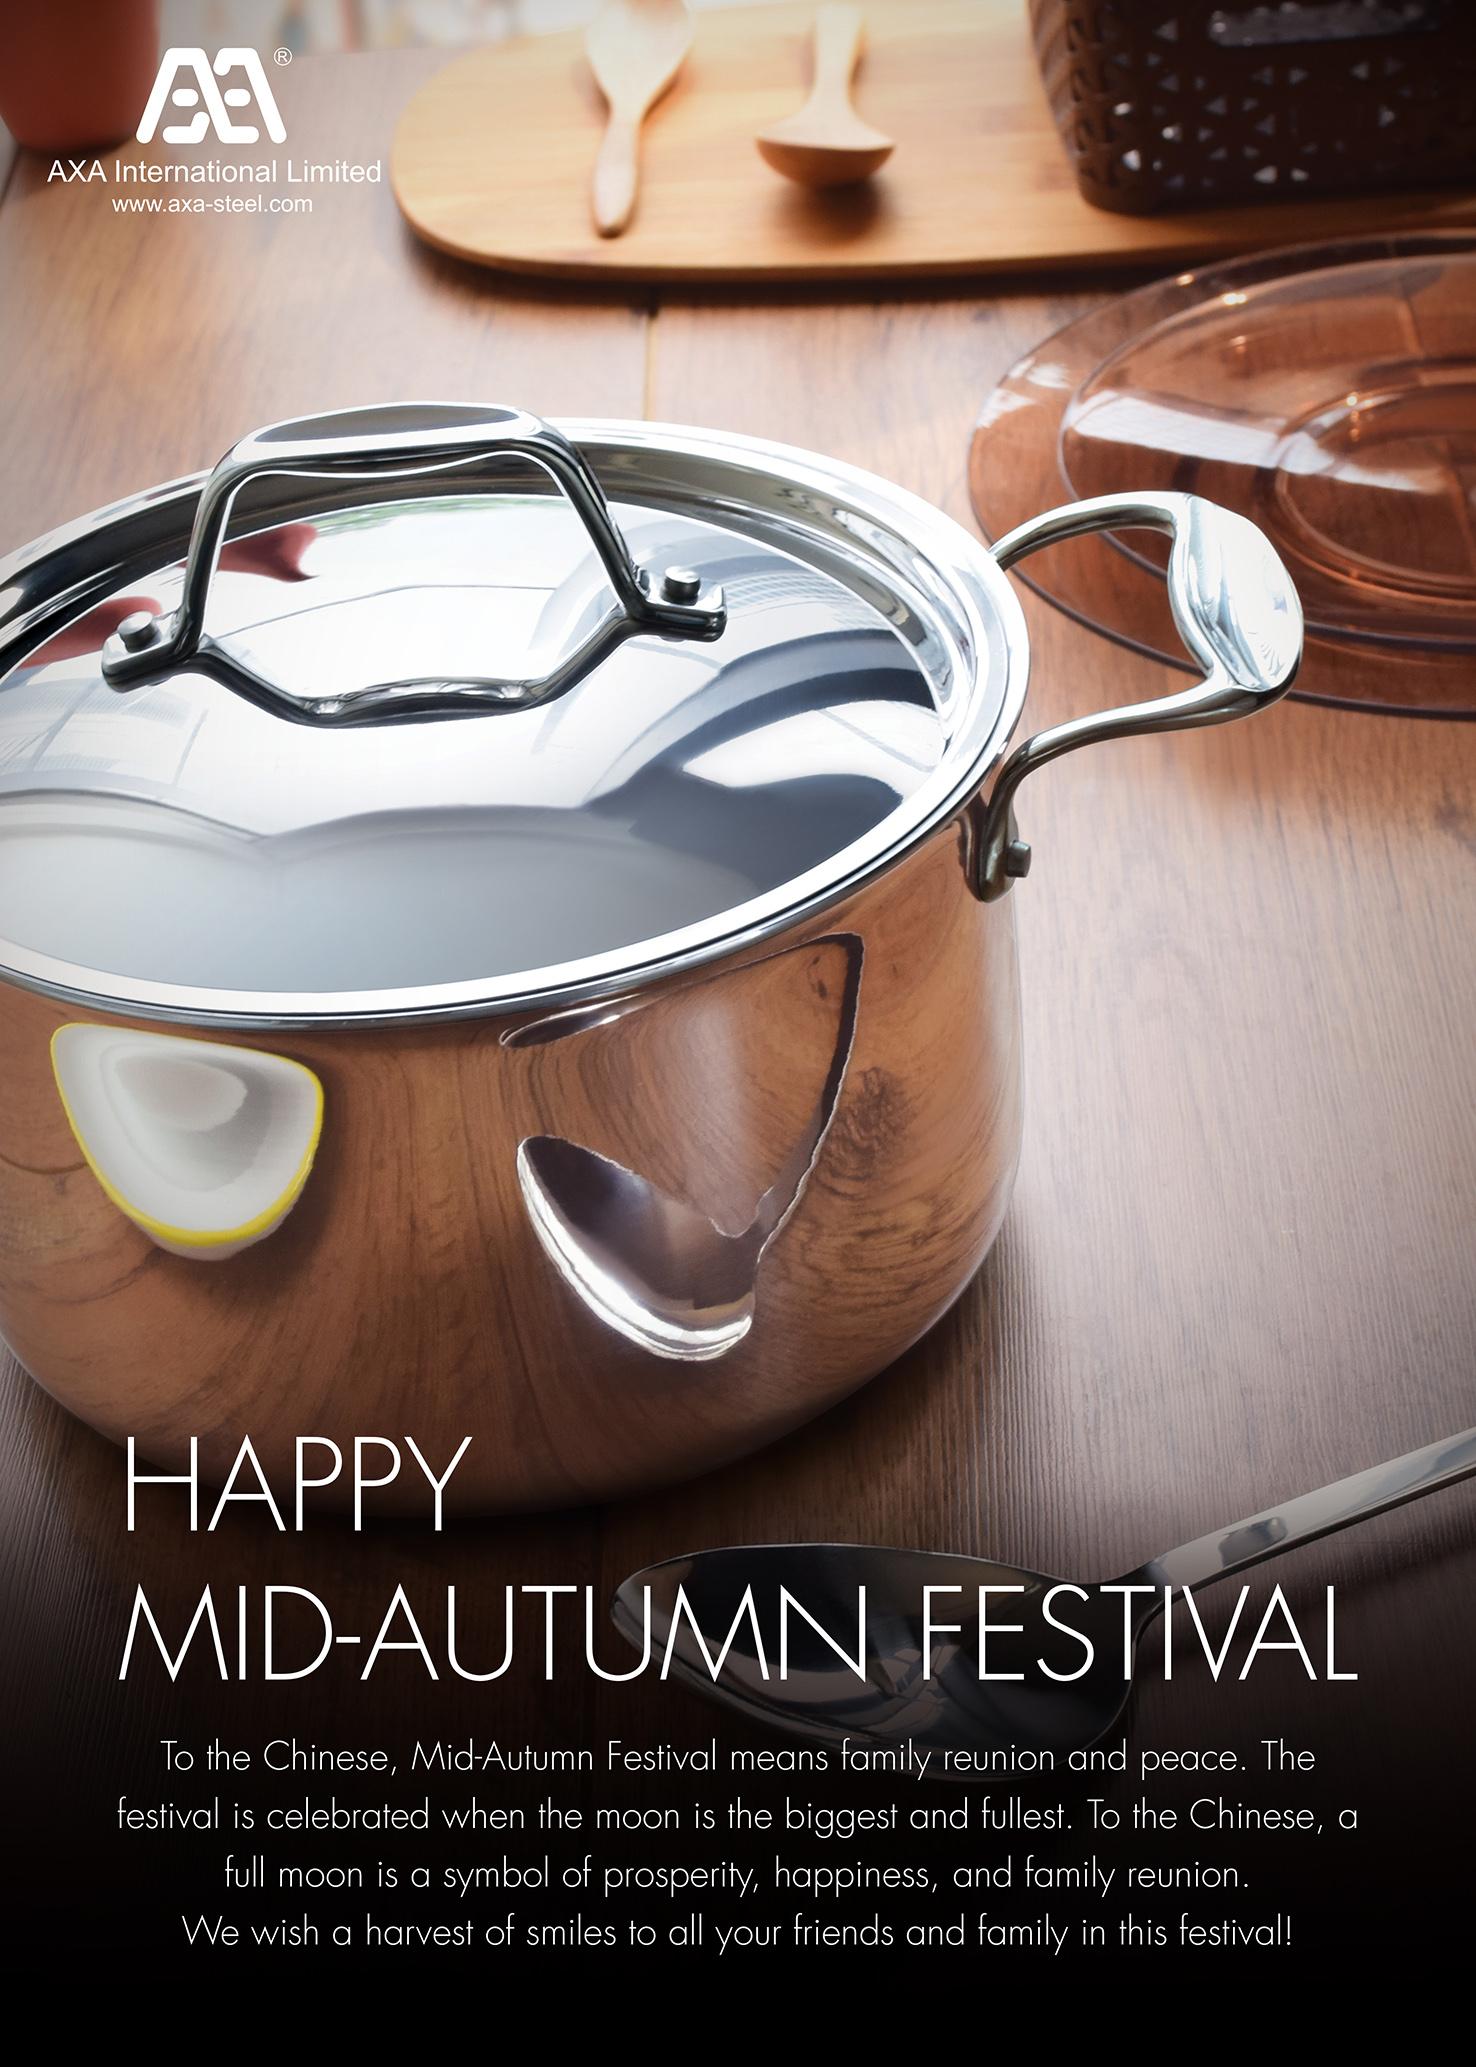 Happy mid autumn festival from axa axa international limited happy mid autumn festival from axa axa international limited stainless steel cookware kristyandbryce Choice Image